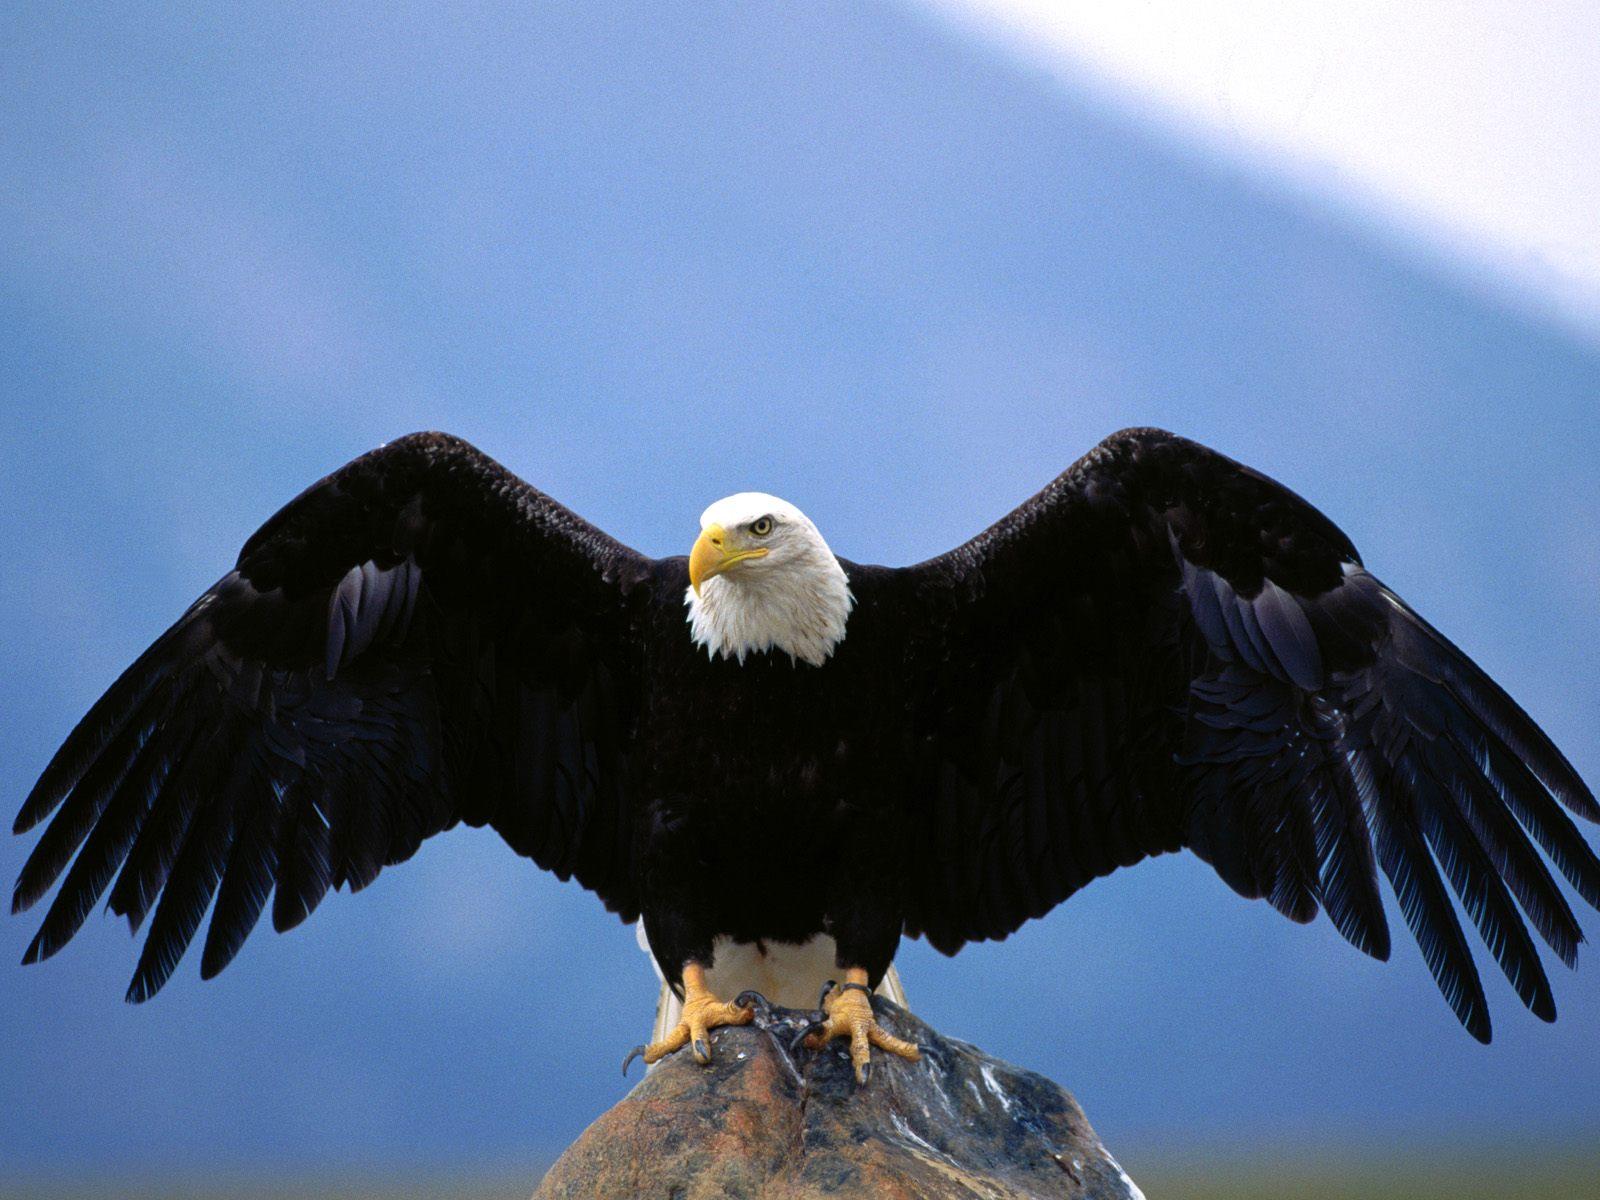 American Bald Eagle Wingspan 1600x1200 STANDARD Image Animals Wild 1600x1200